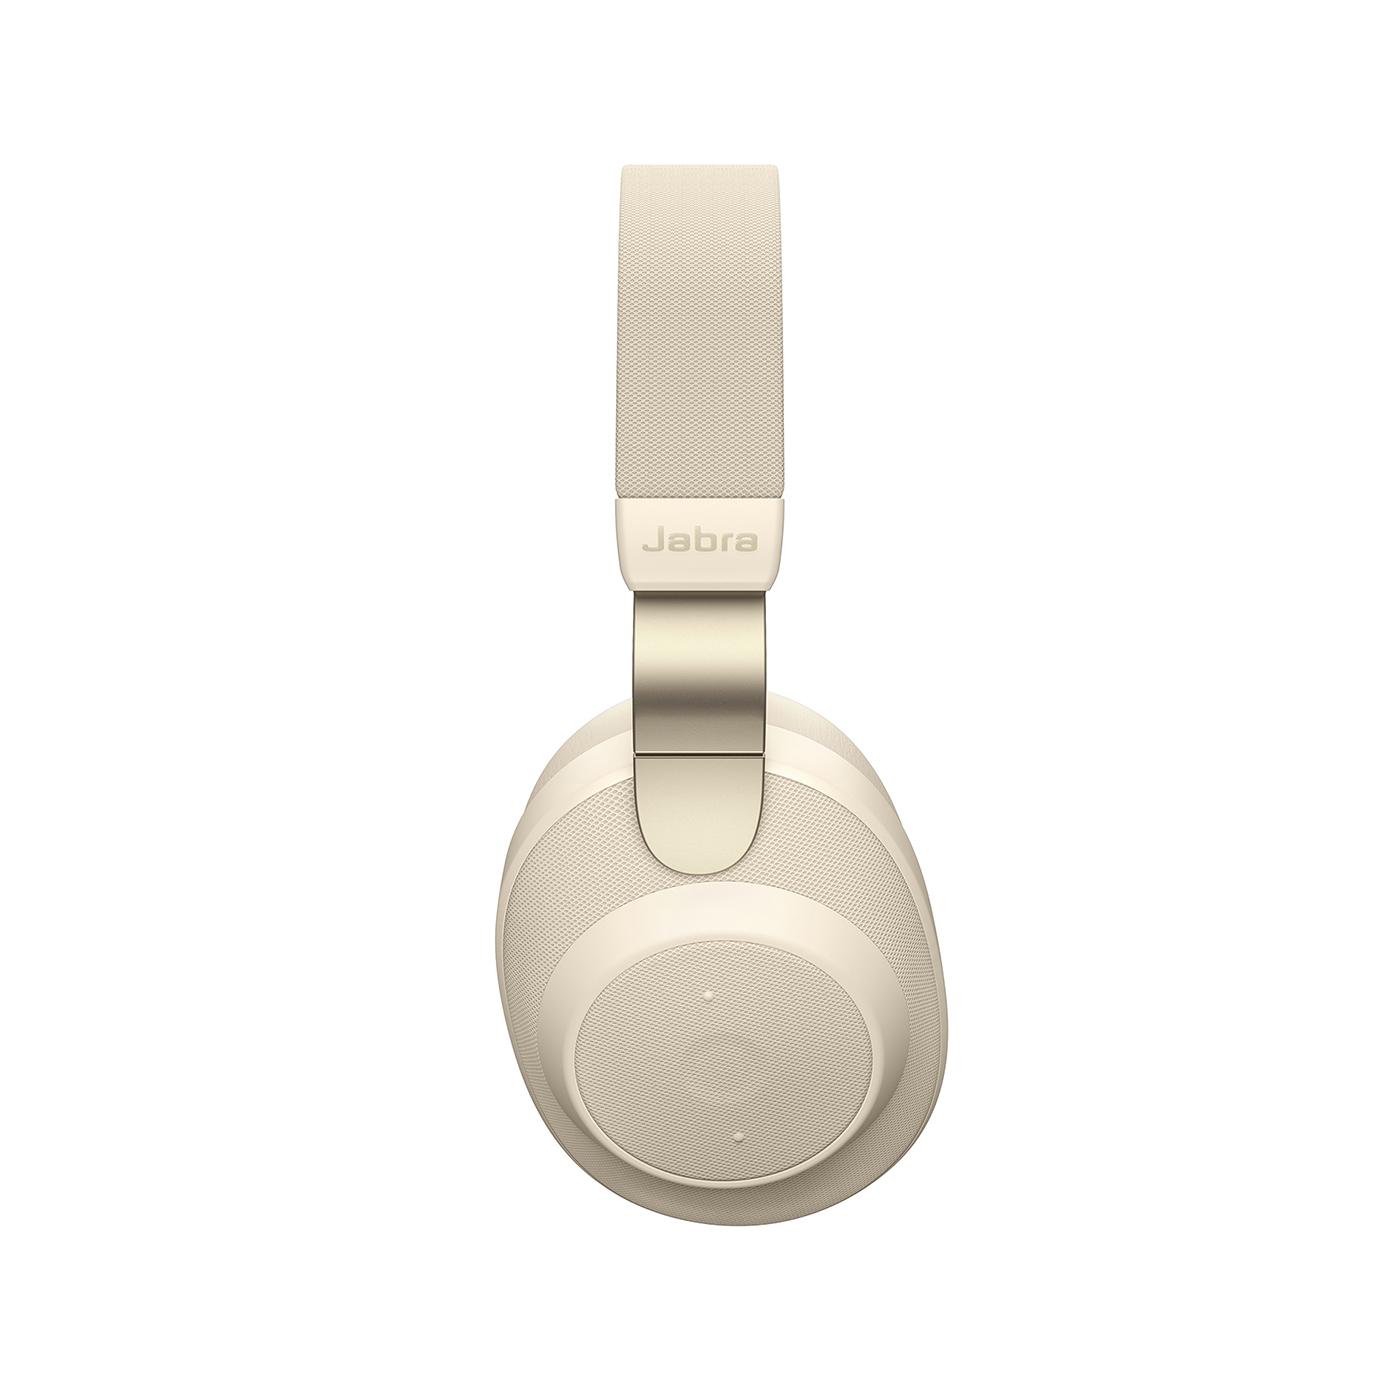 Jabra-Elite-85h-Wireless-Stereo-ANC-Headphones thumbnail 9